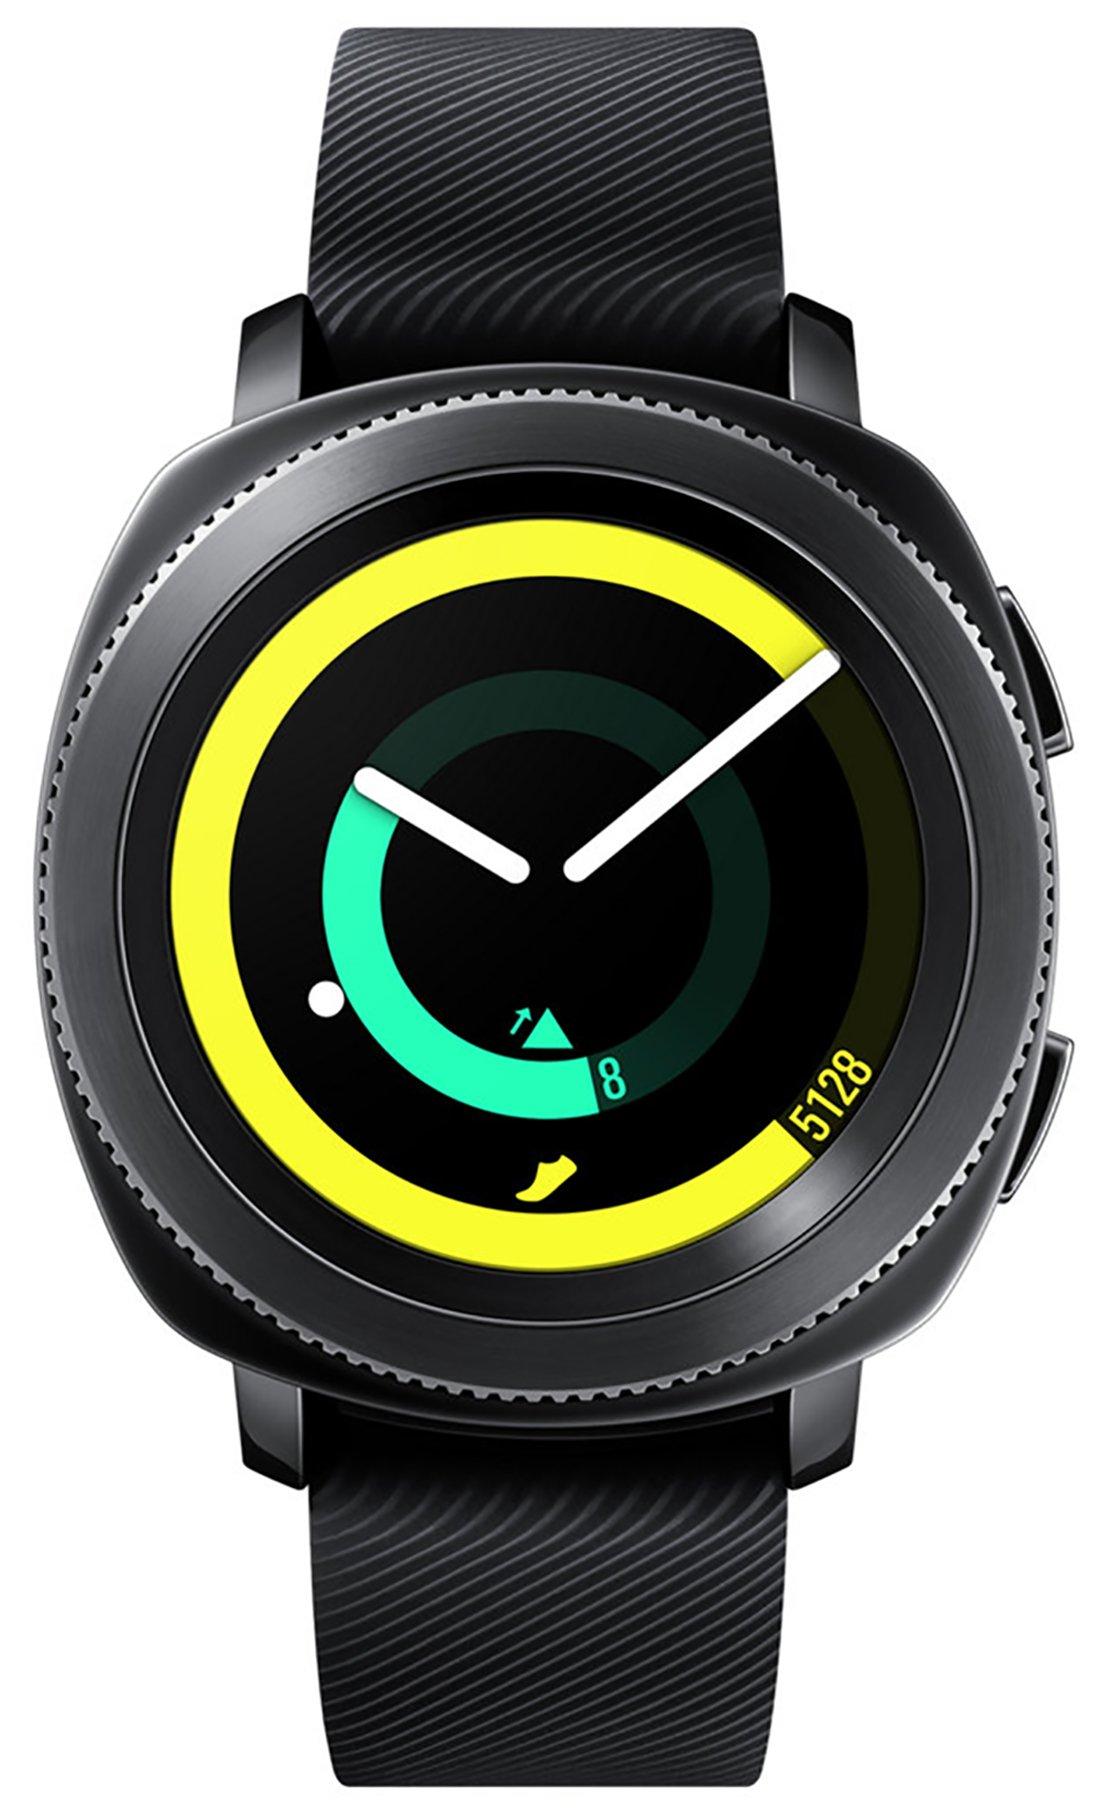 Samsung Gear Sport Smartwatch Fitness Tracker- Water Resistant - International Version- No Warranty- Black (SM-R600NZKATTT) by Samsung (Image #1)